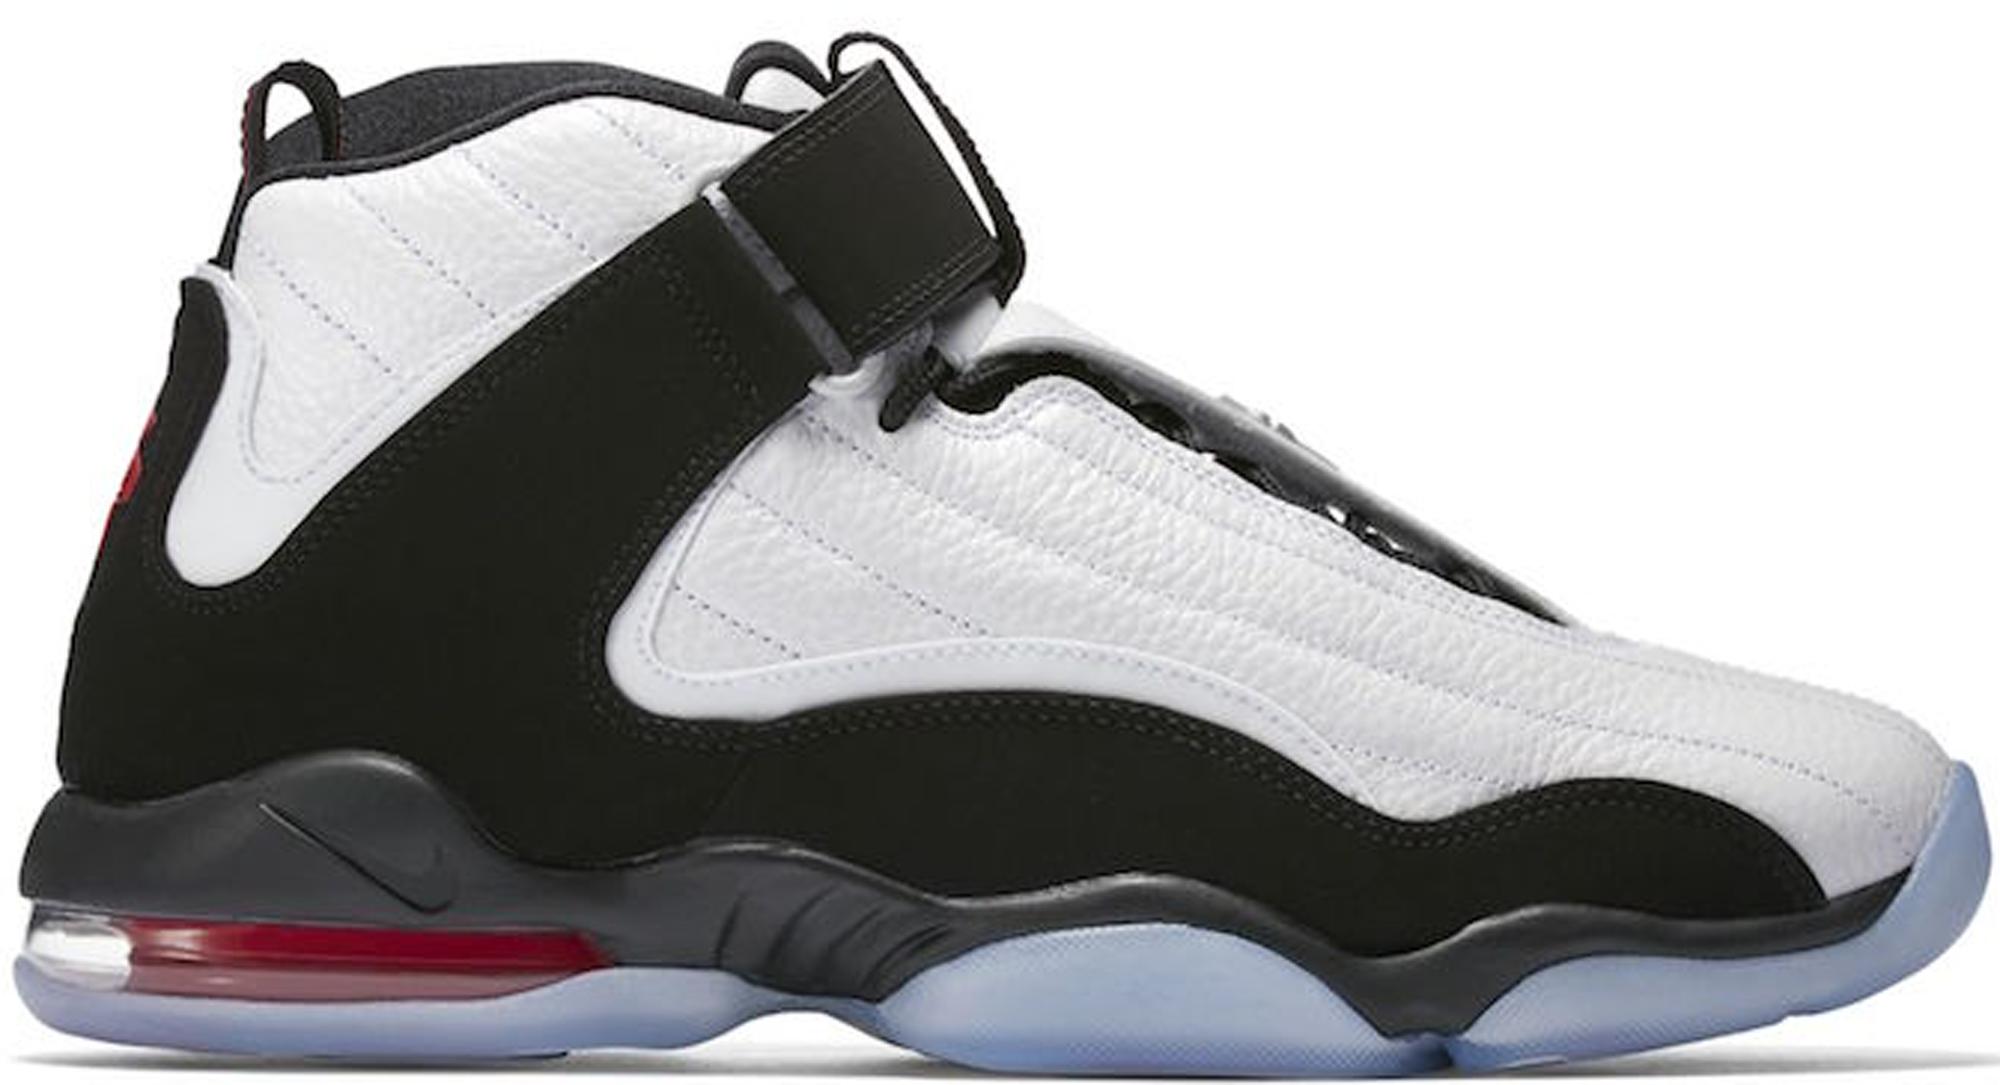 Nike Air Penny IV Chicago - StockX News